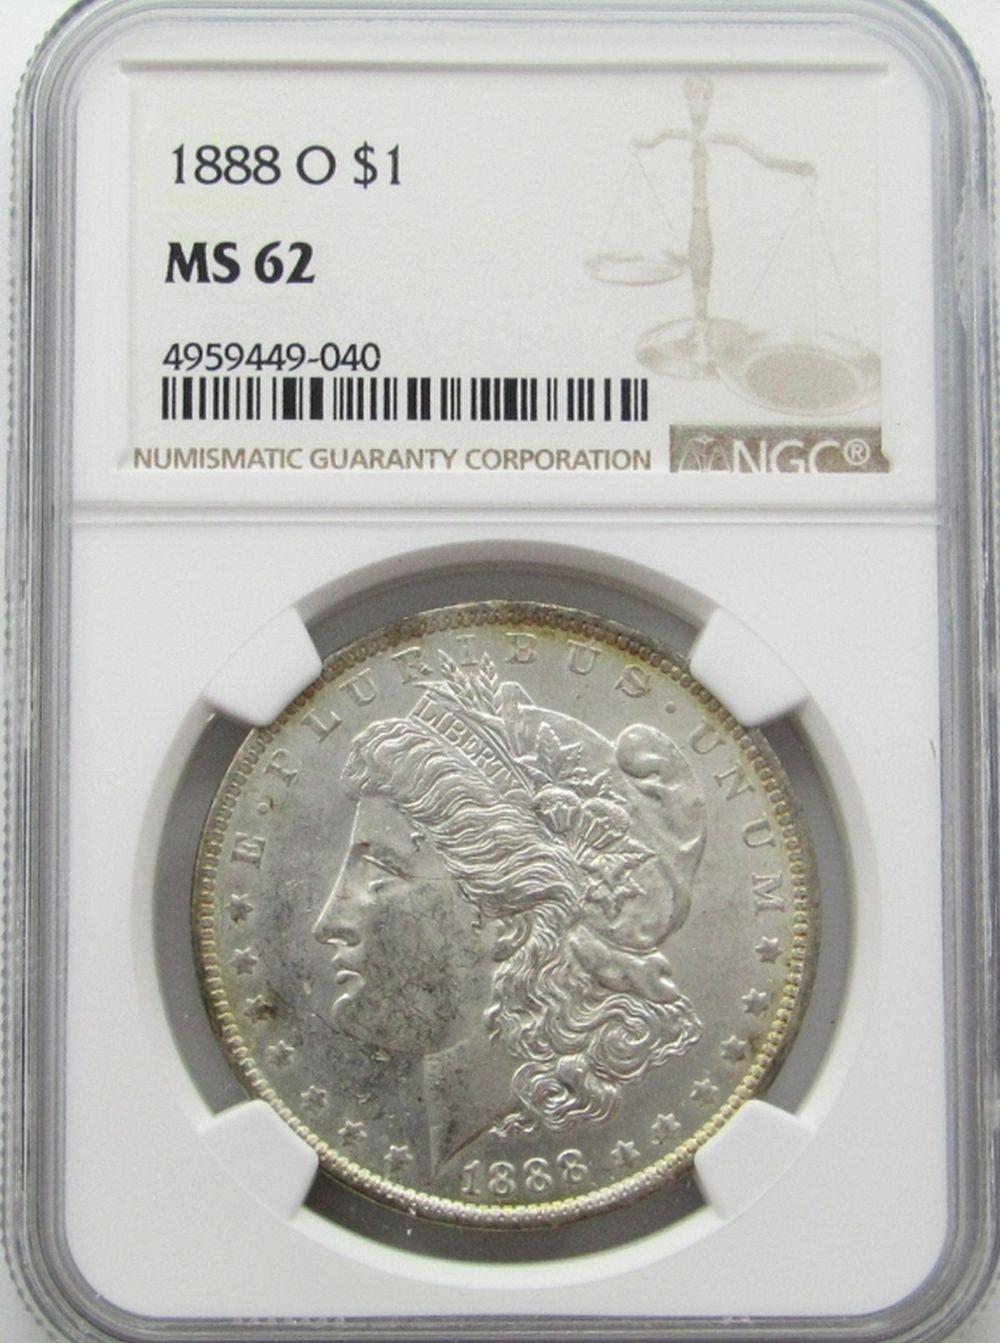 1888-O Morgan Silver Dollar $ NGC MS 62 Lightly To